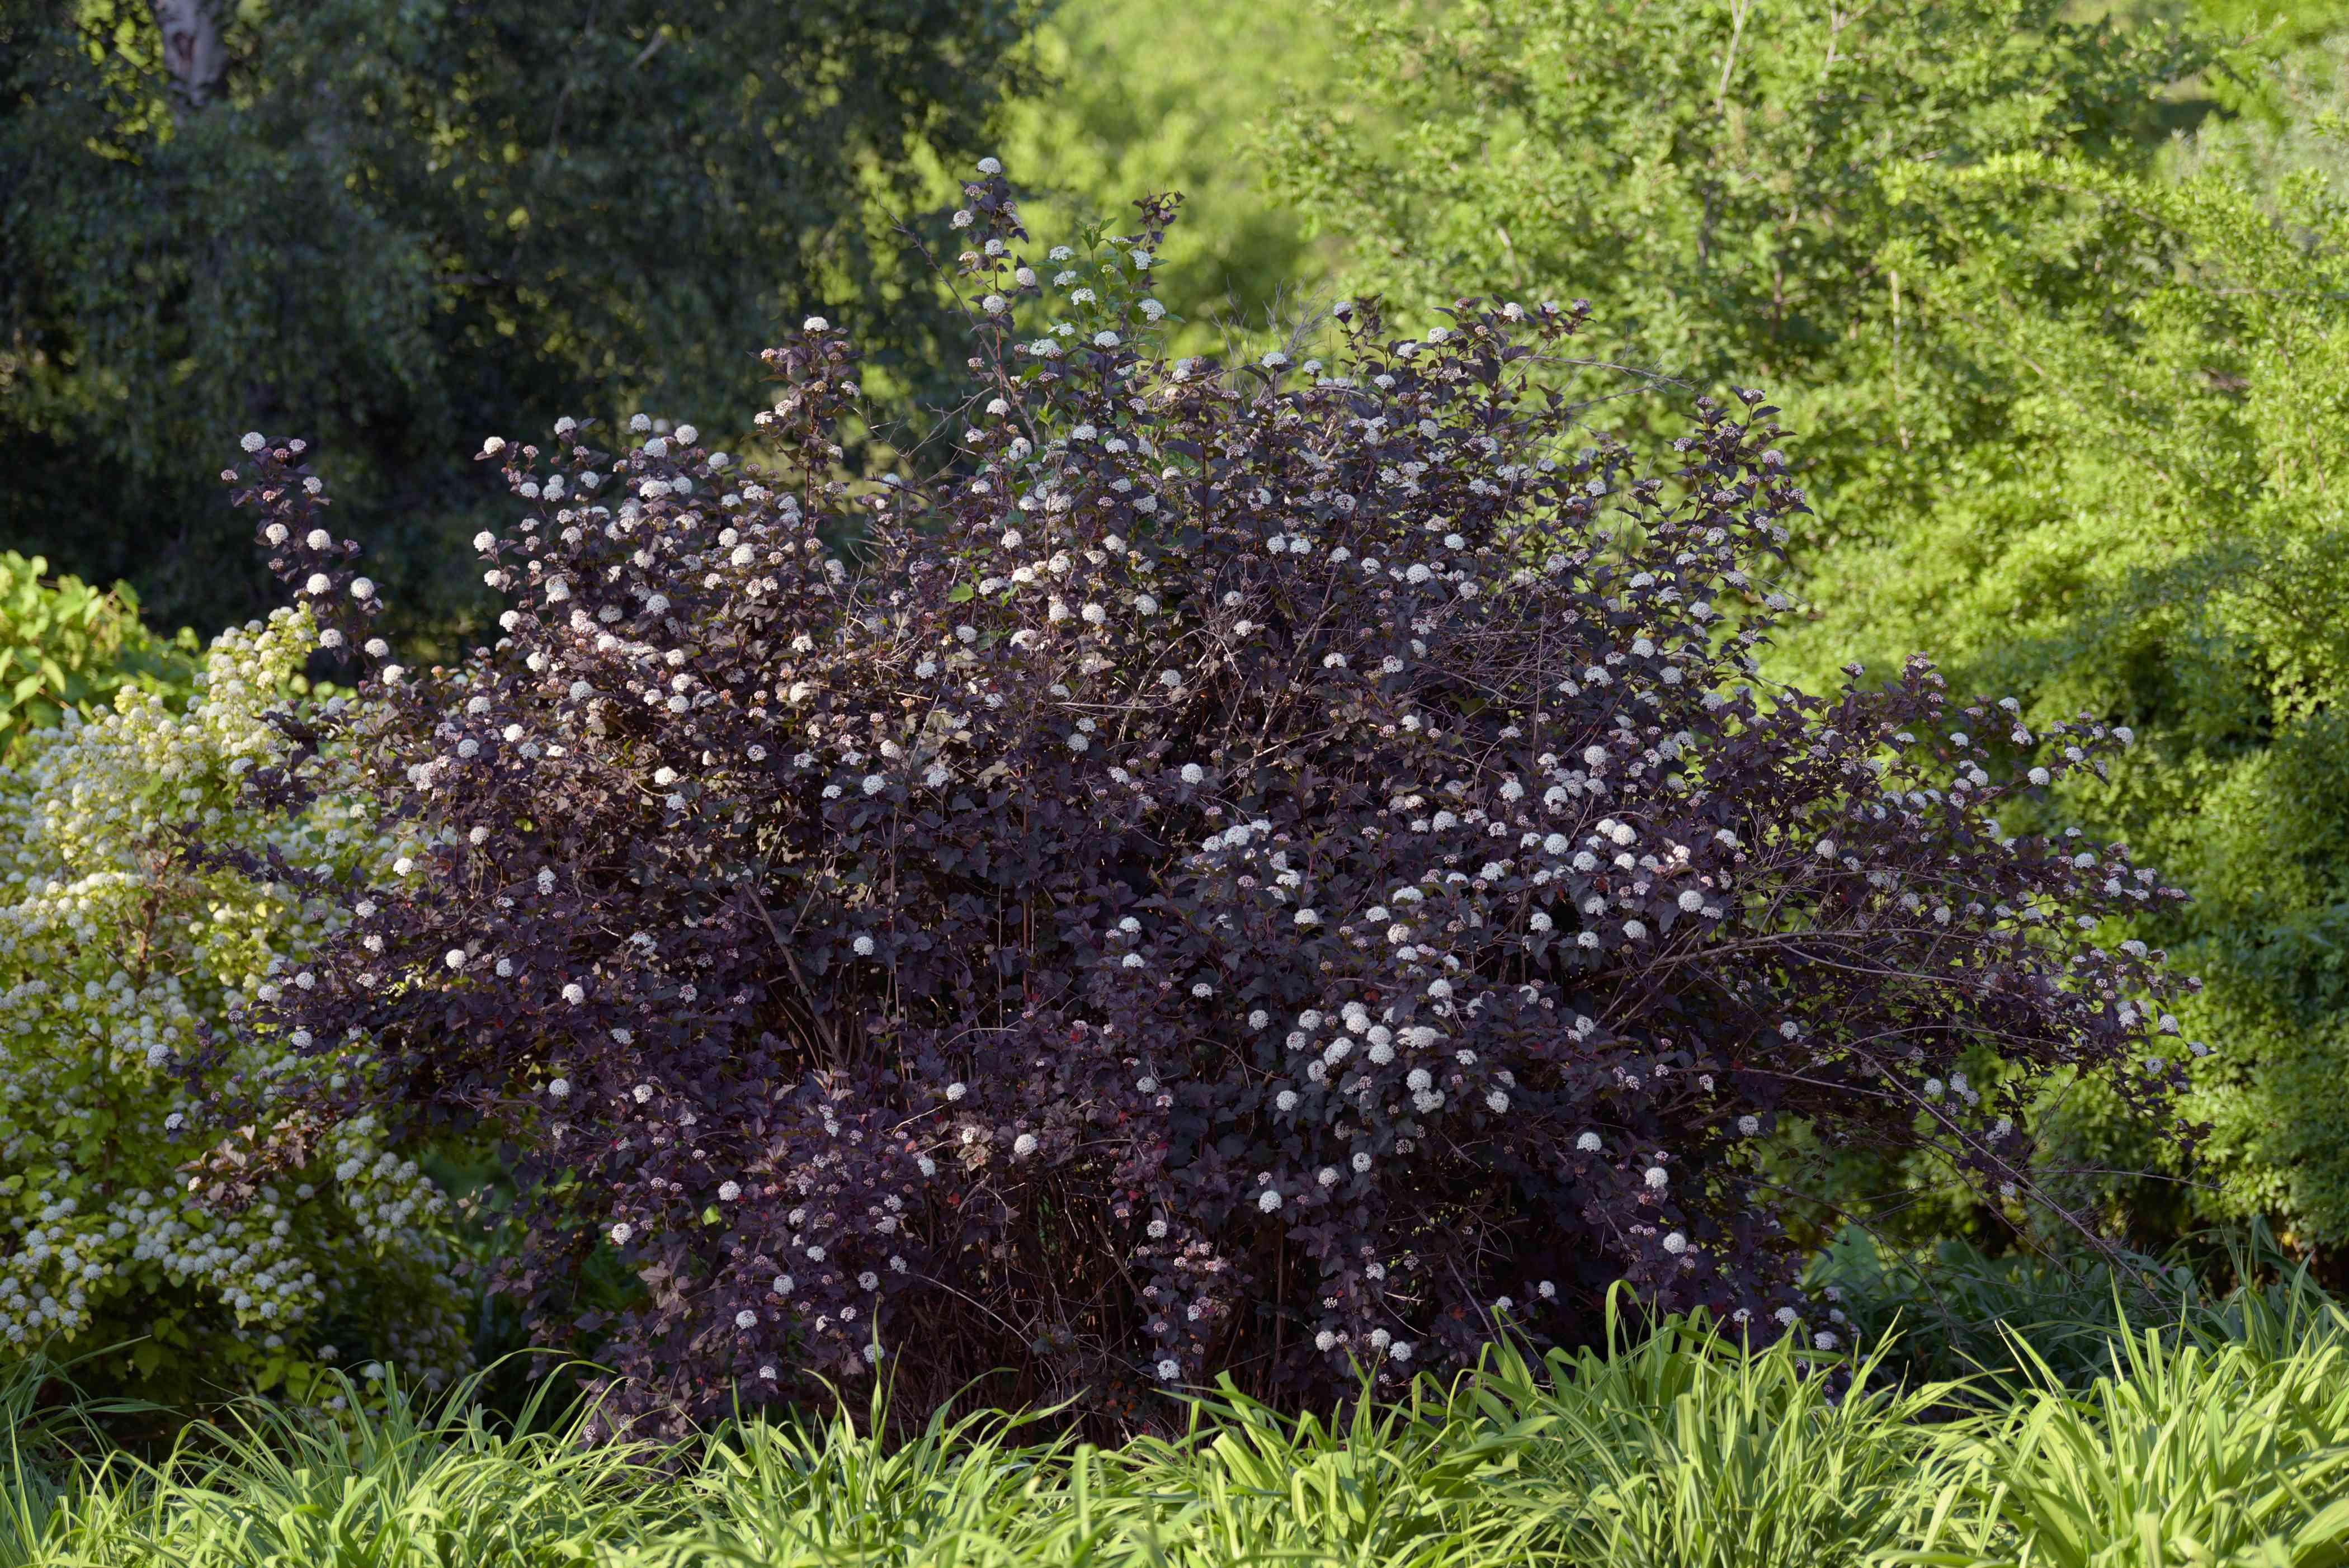 Diablo ninebark shrub with dark purple leaves and small white flowers